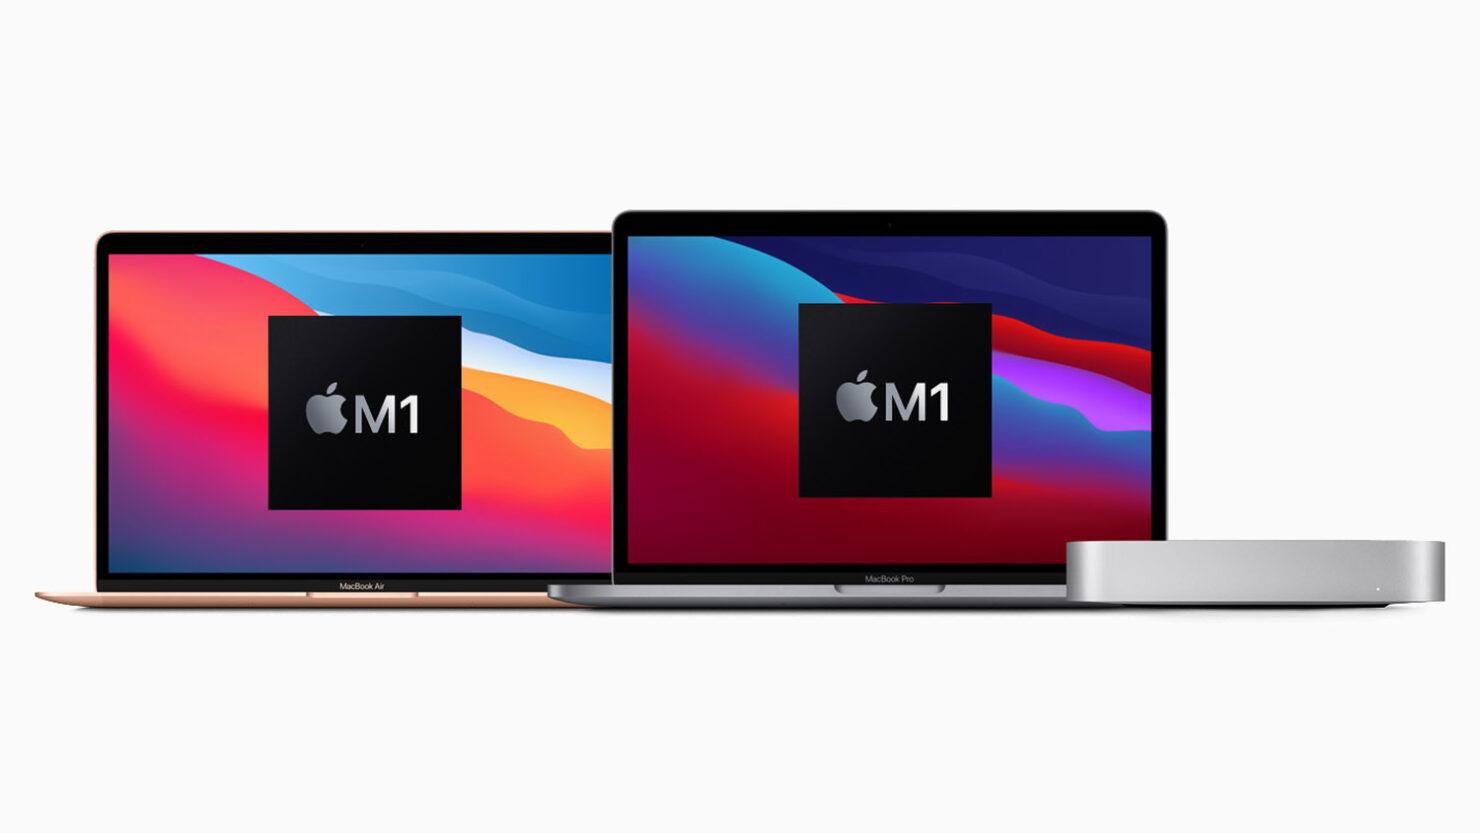 Apple Files New 'B2002' Product Alongside Its M1 Macs in Bluetooth Database